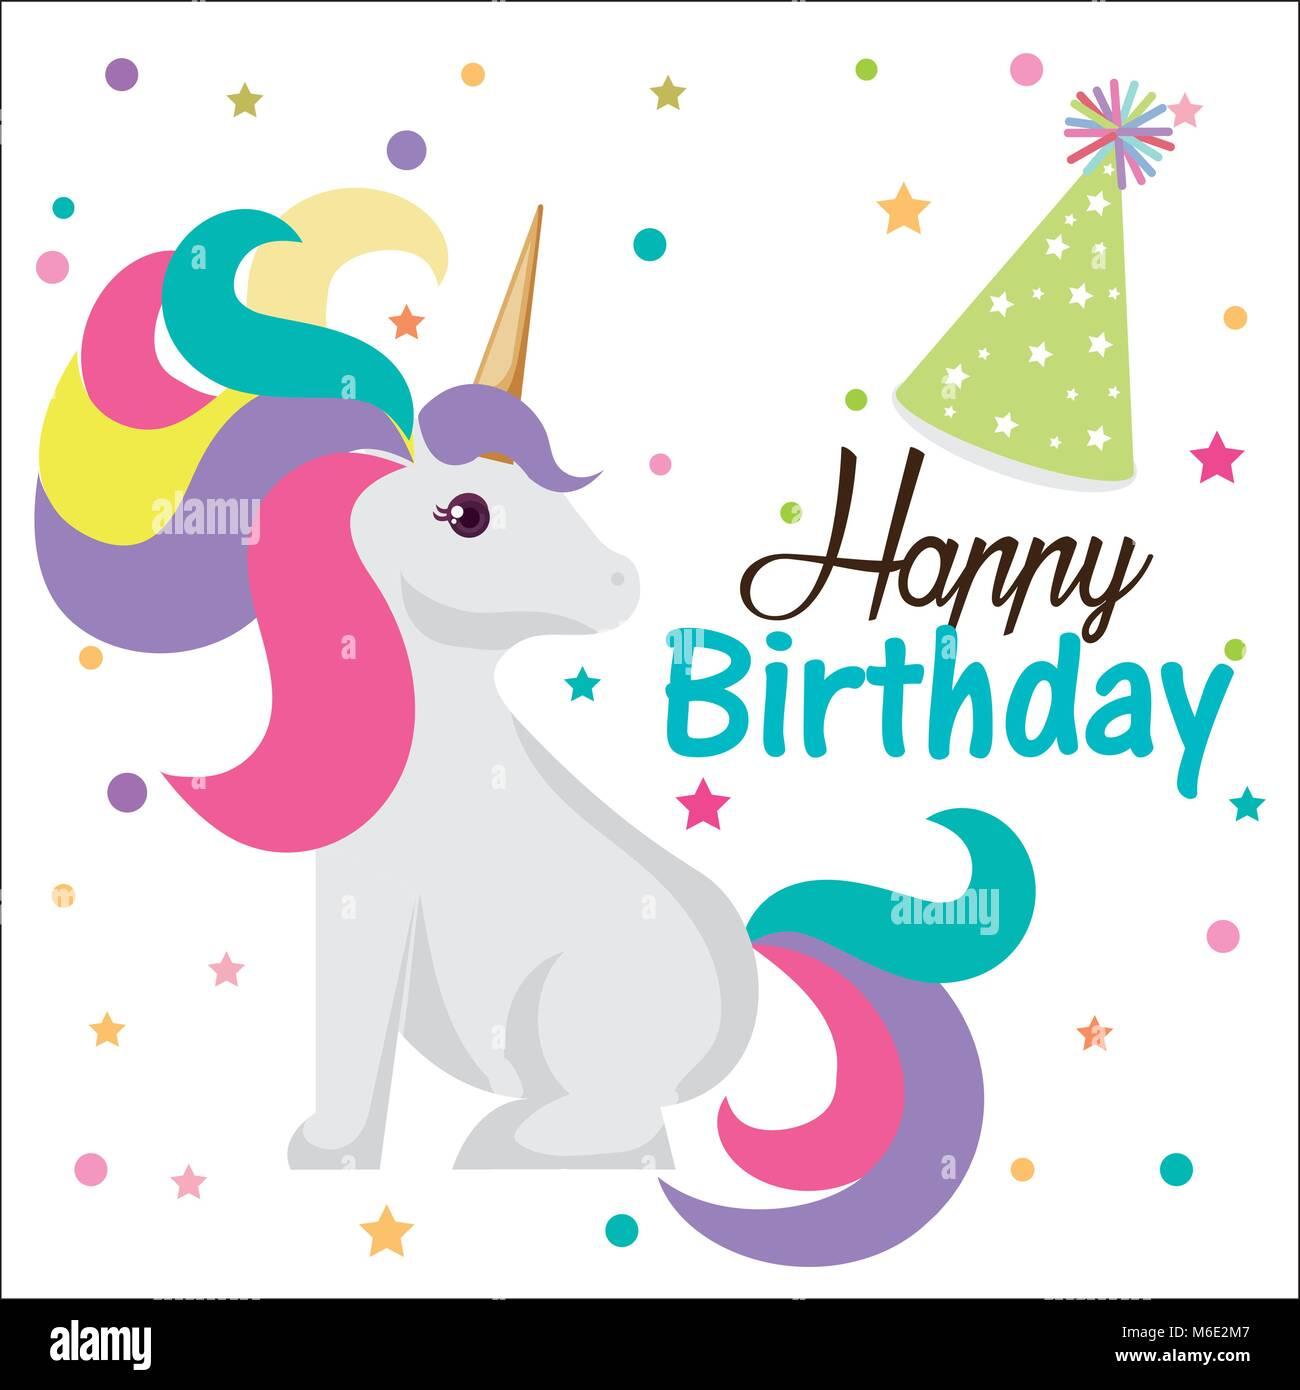 Happy Birthday Card With Unicorn Character Stock Vector Art